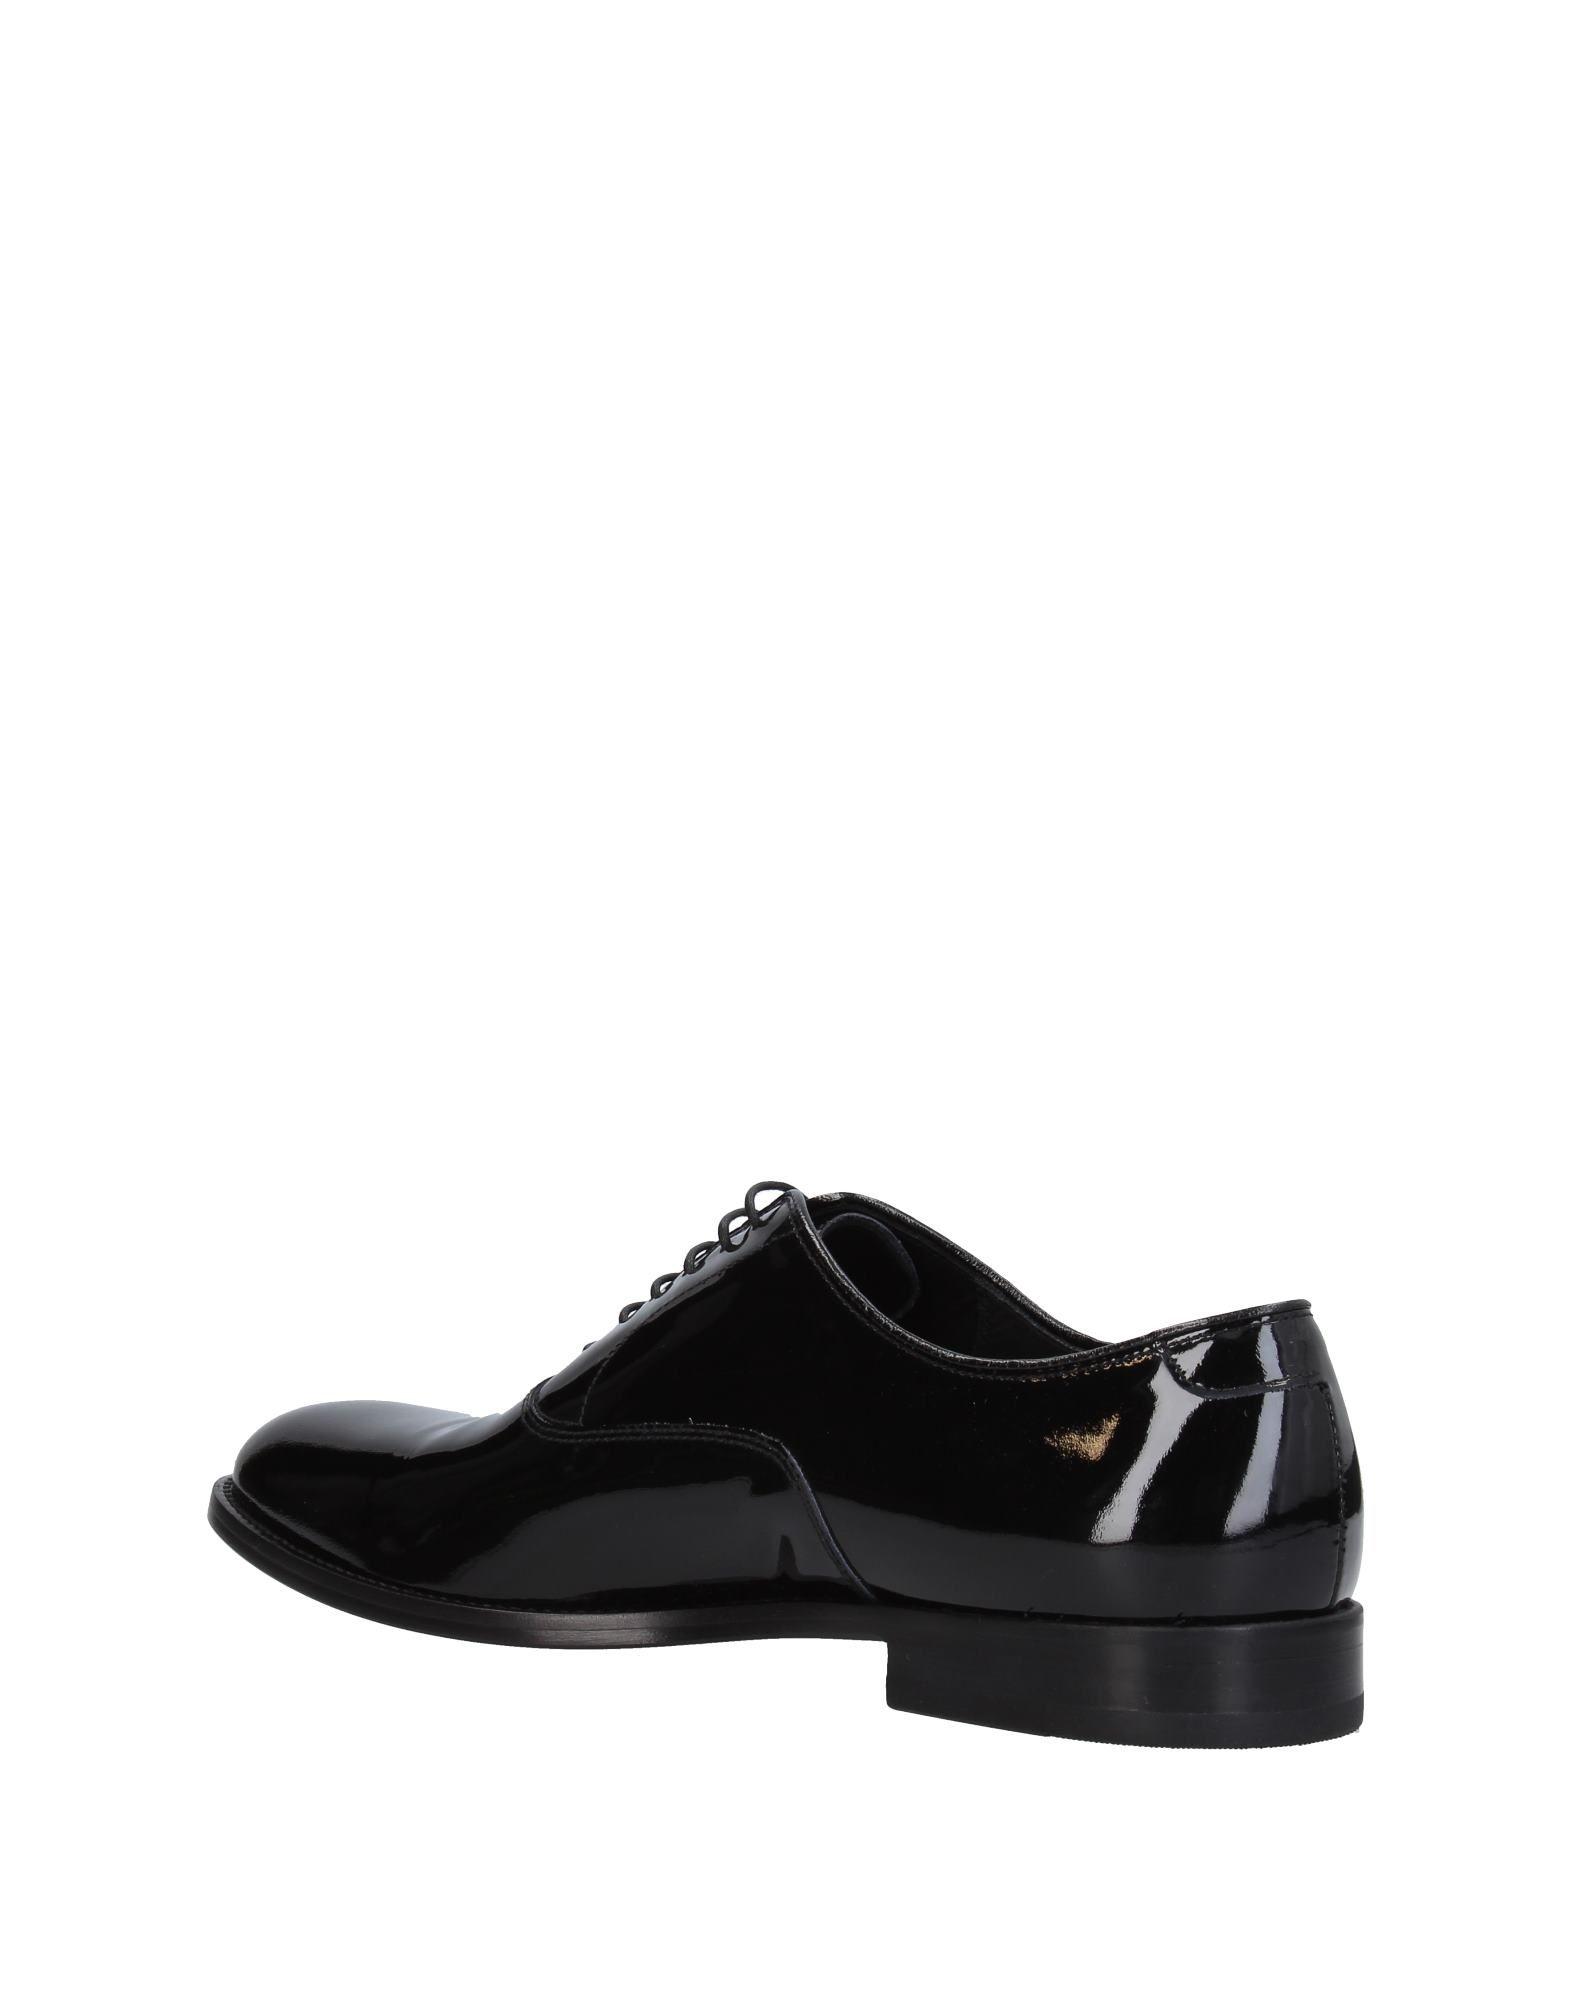 Doucal's Schnürschuhe Herren Heiße  11393221UD Heiße Herren Schuhe 58c31e